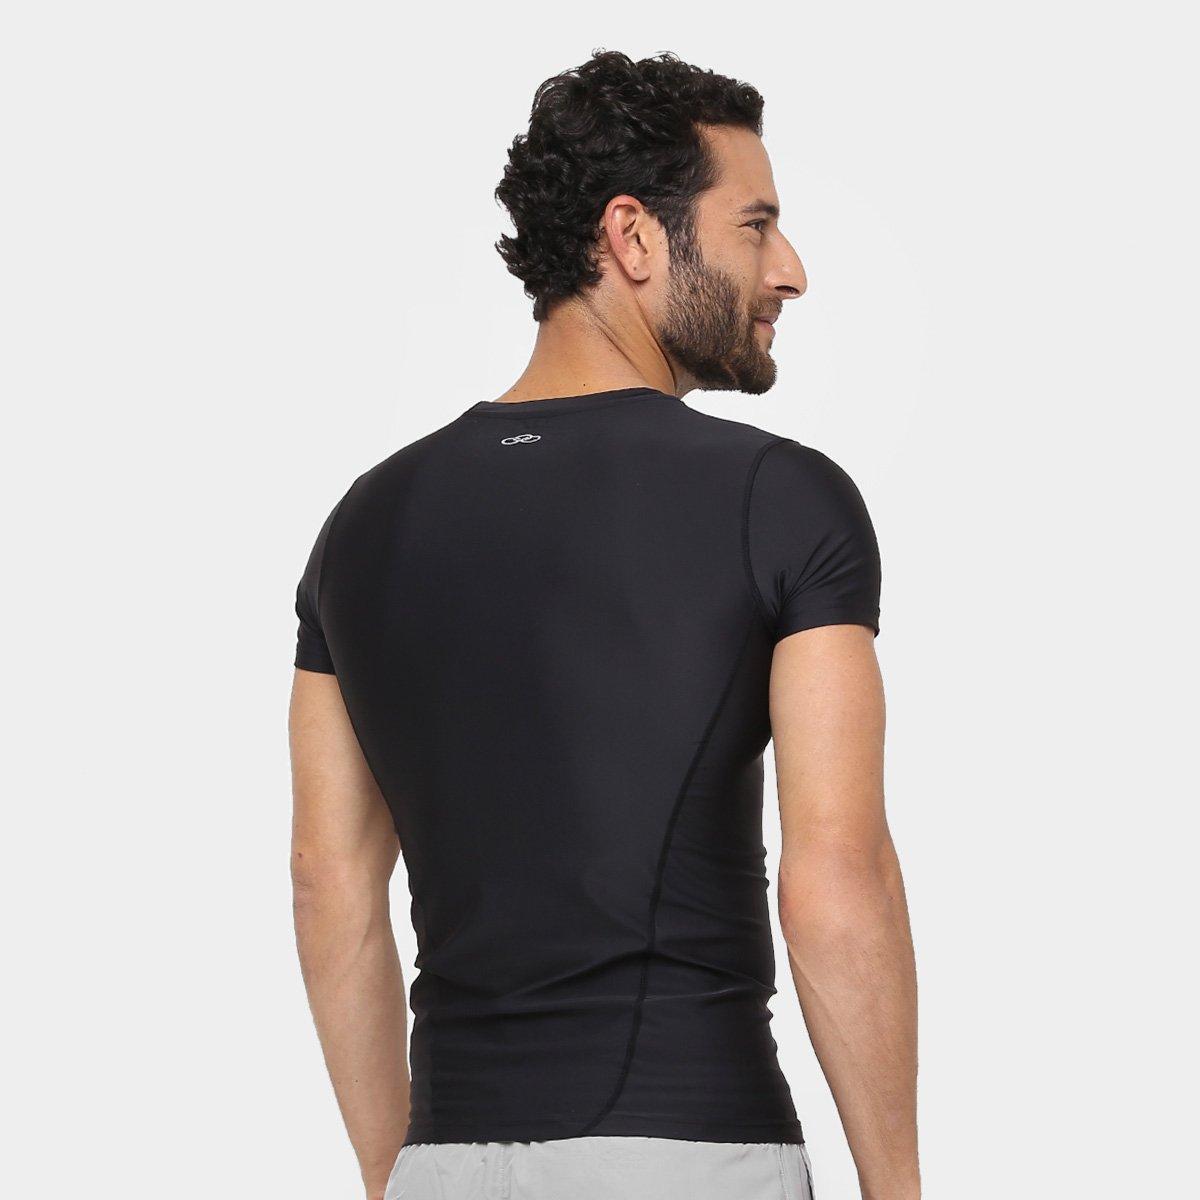 Camiseta Olympikus Compressão Masculina  Camiseta Olympikus Compressão  Masculina ... 2f3b92d81c782